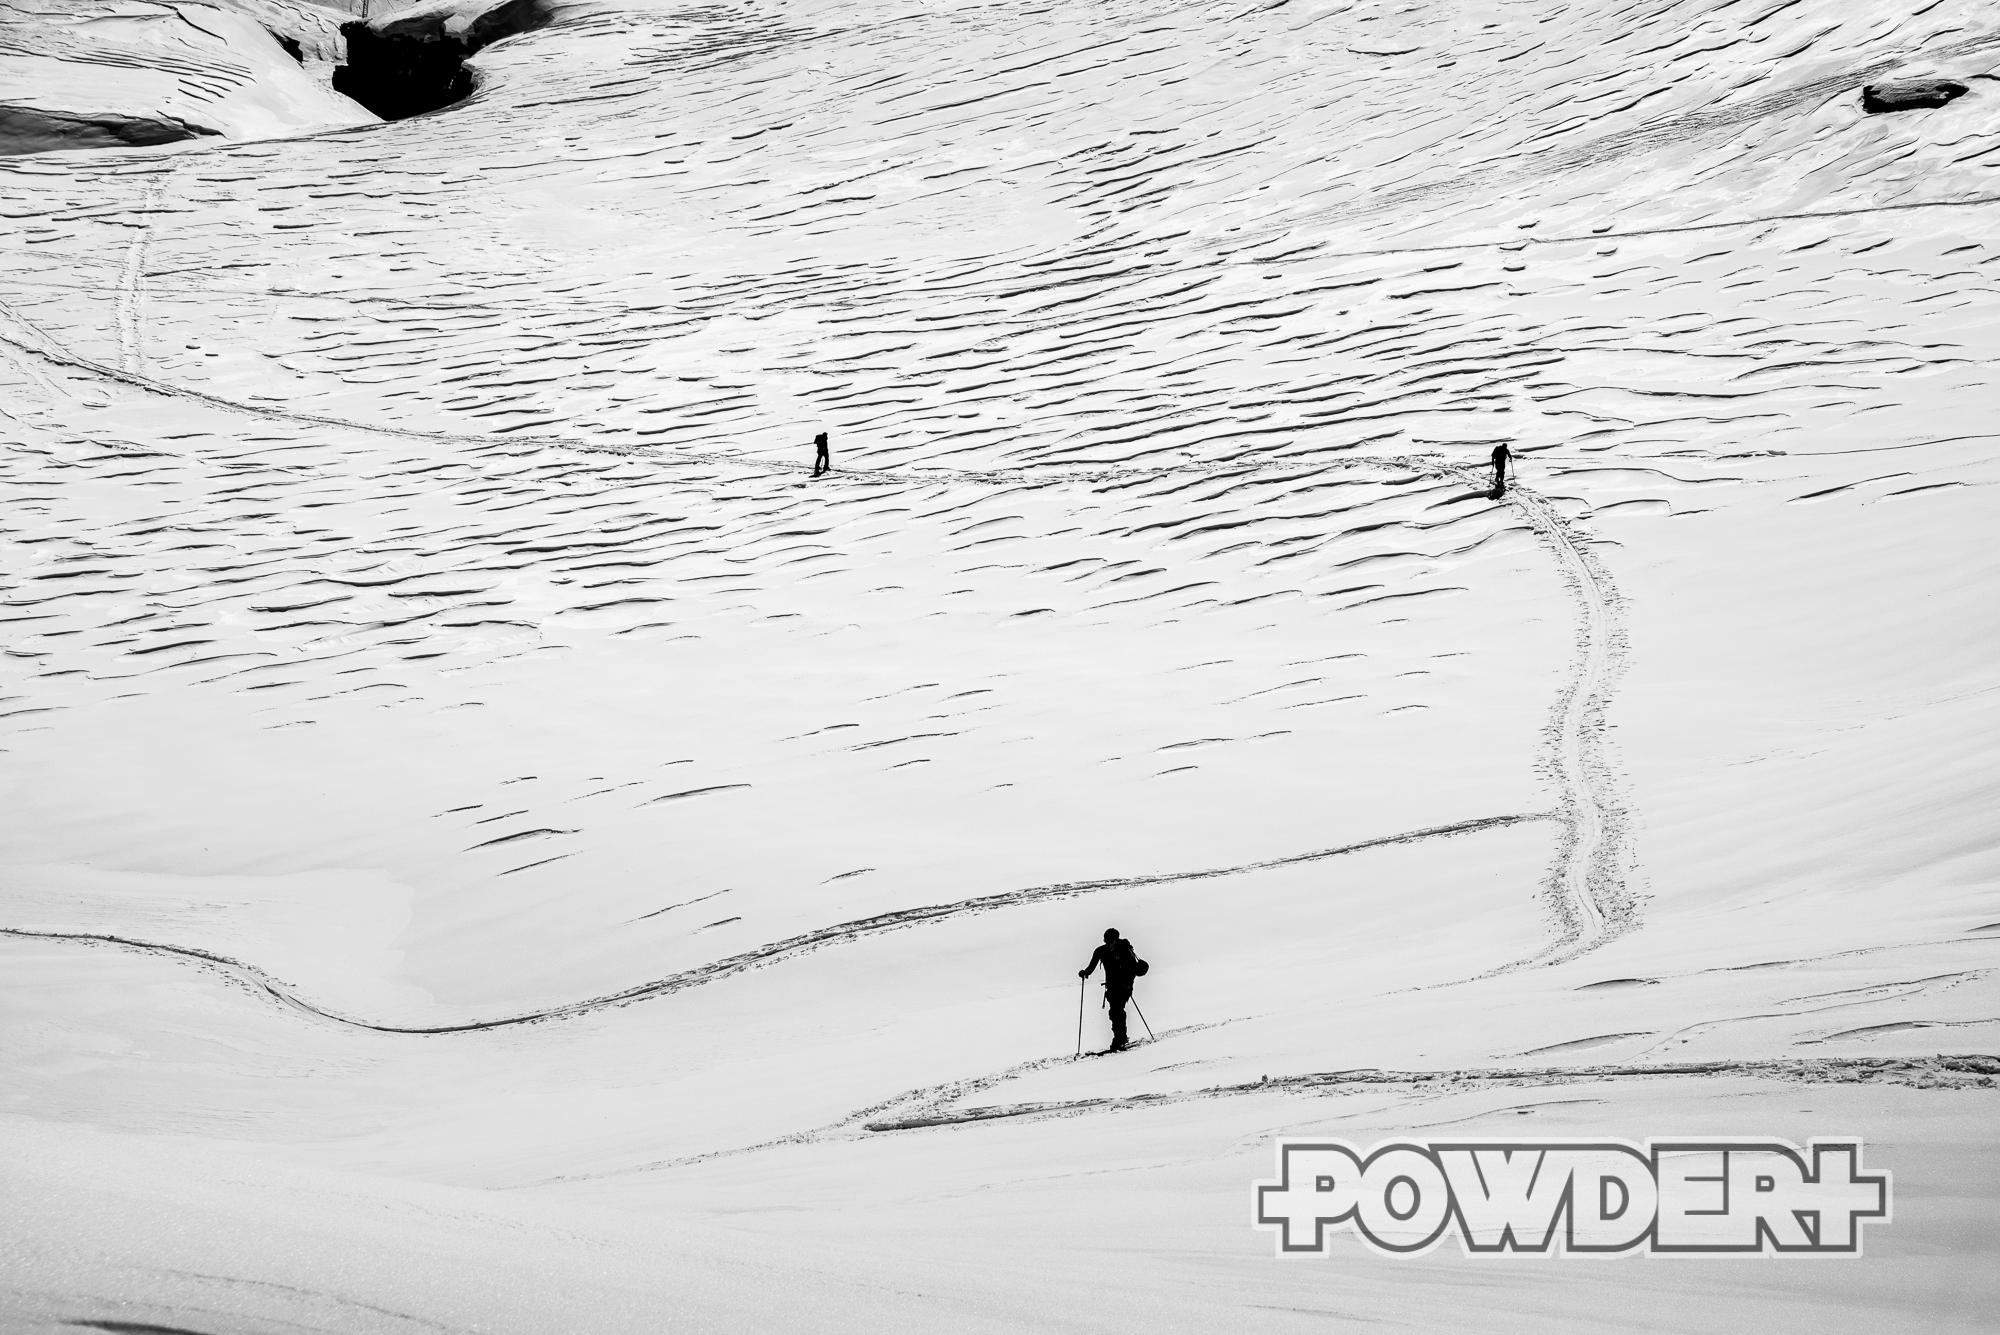 freeride, powder report, skitour, freeridetour, salsa,gressoney